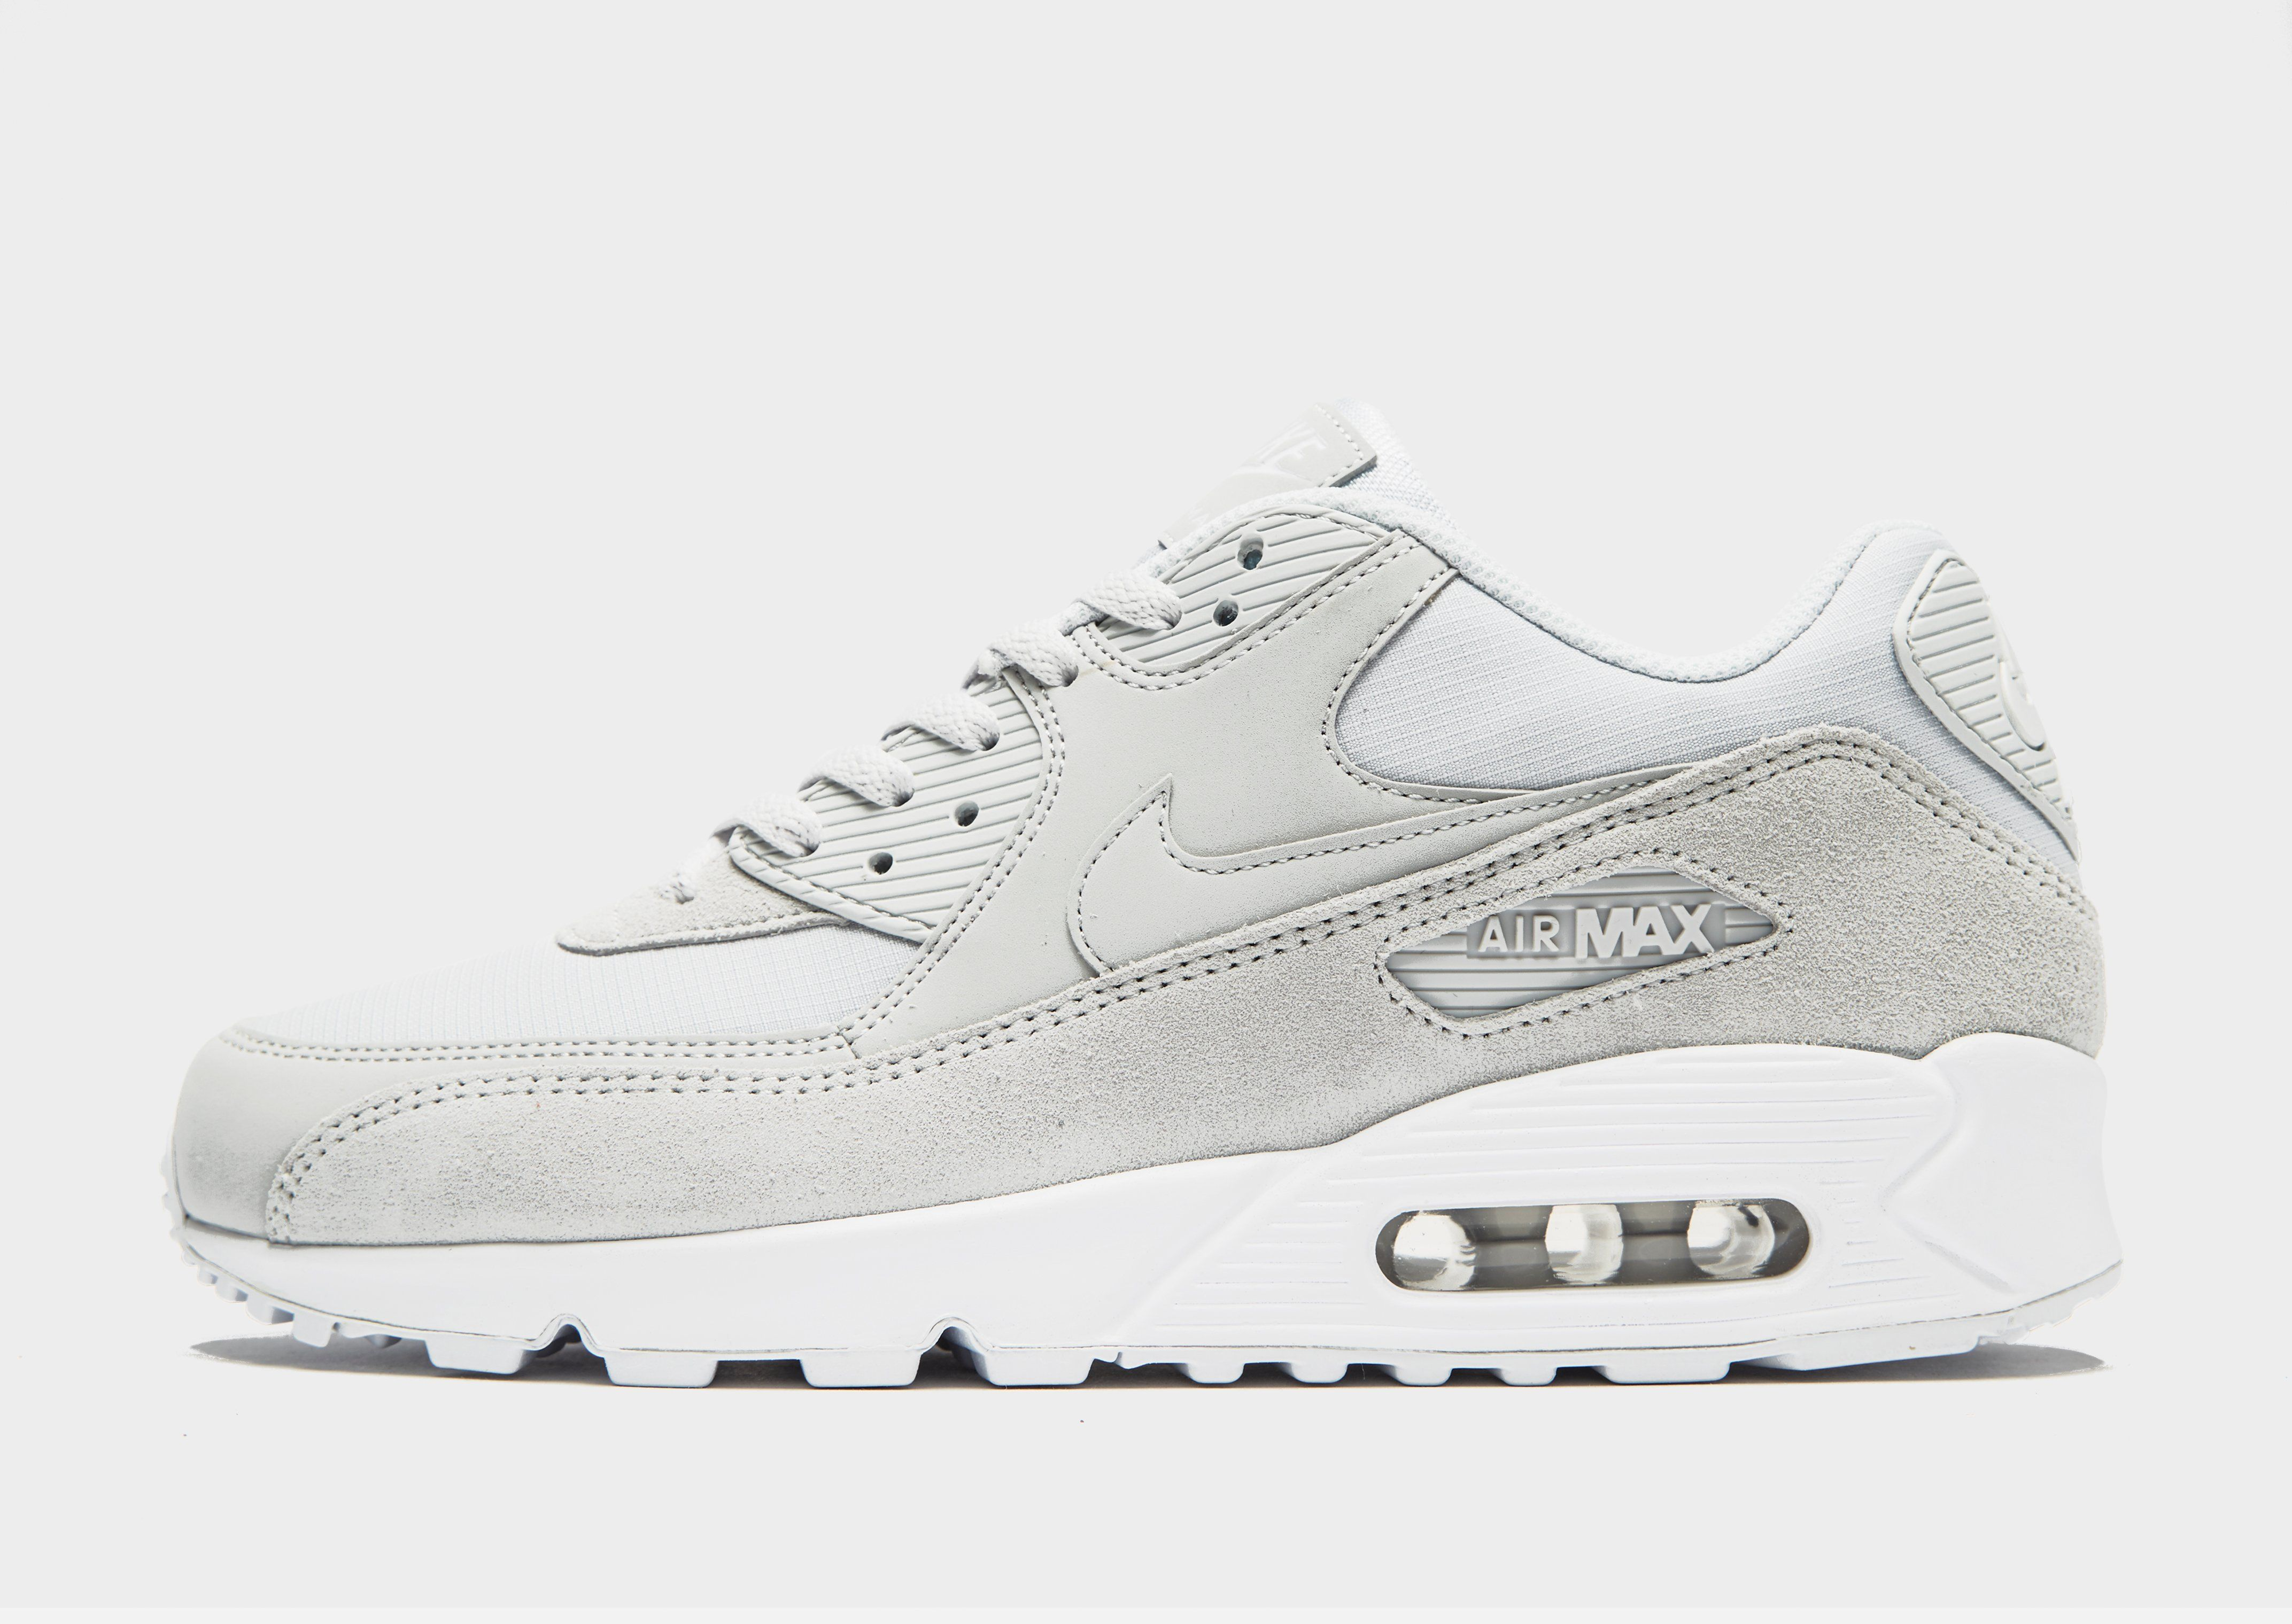 new styles a3997 c29d3 Nike Air Max 90 Essential Ripstop Herr   JD Sports Sverige